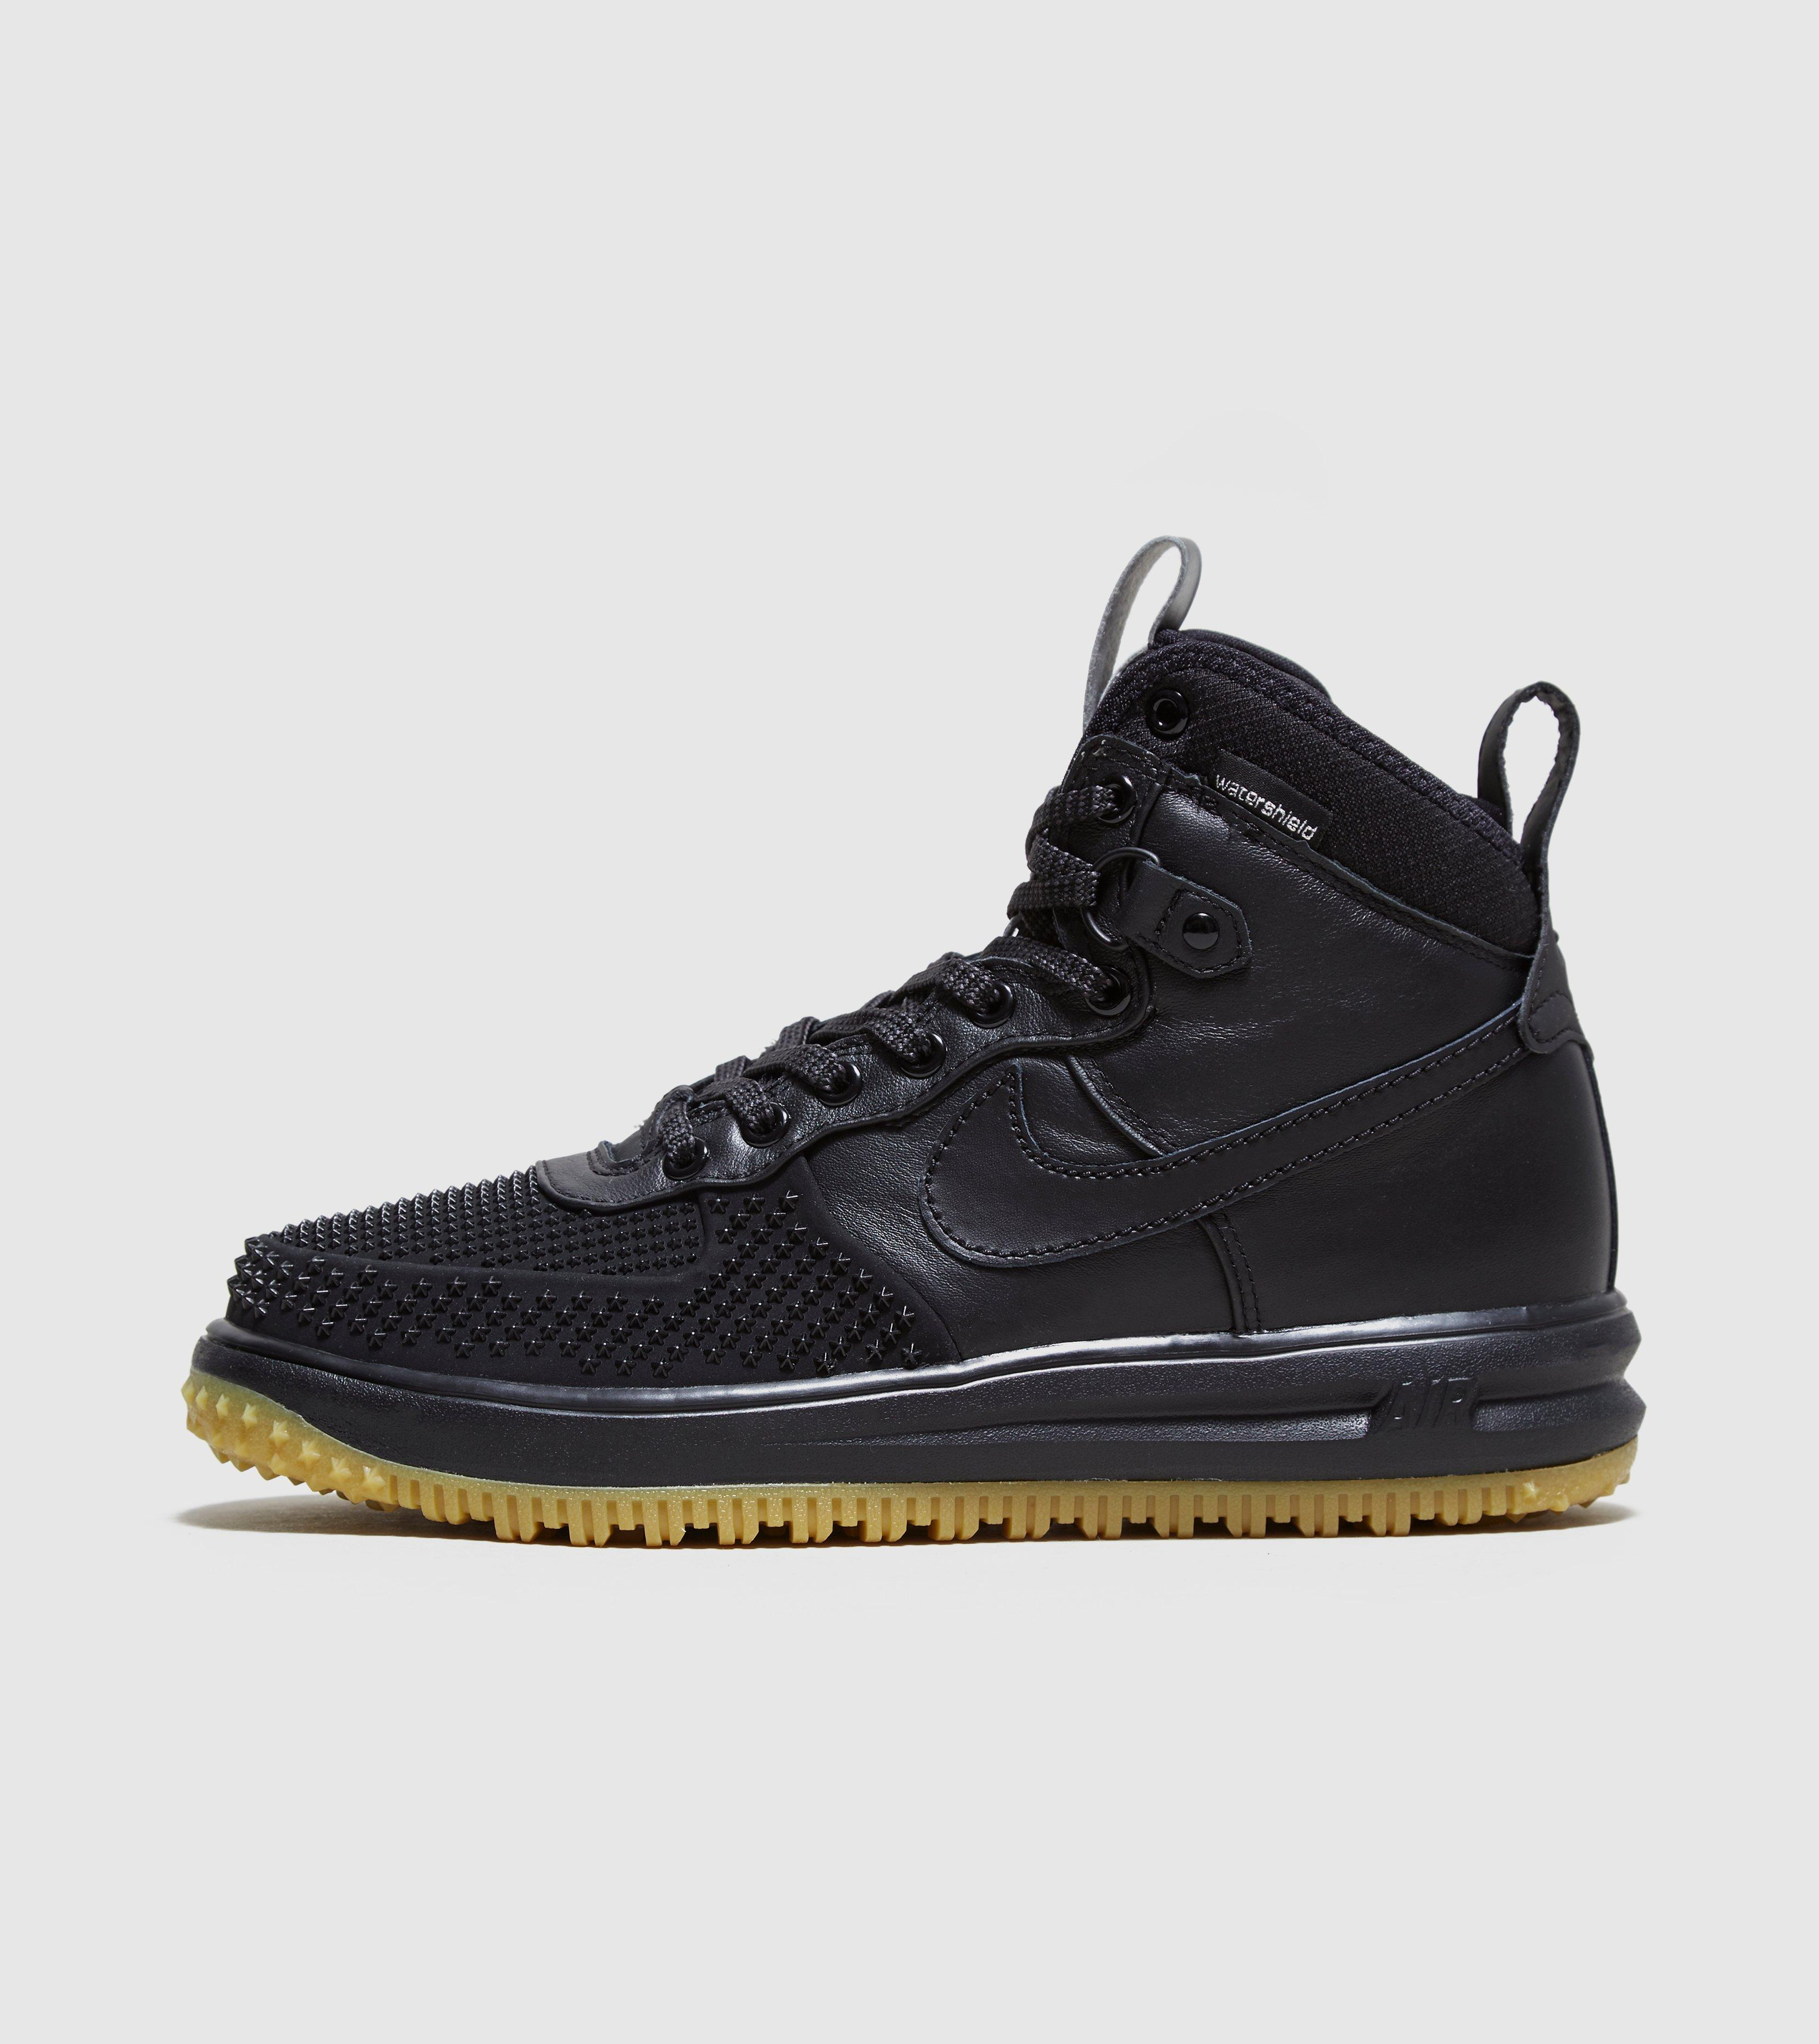 nike air force duck boot uk chemist